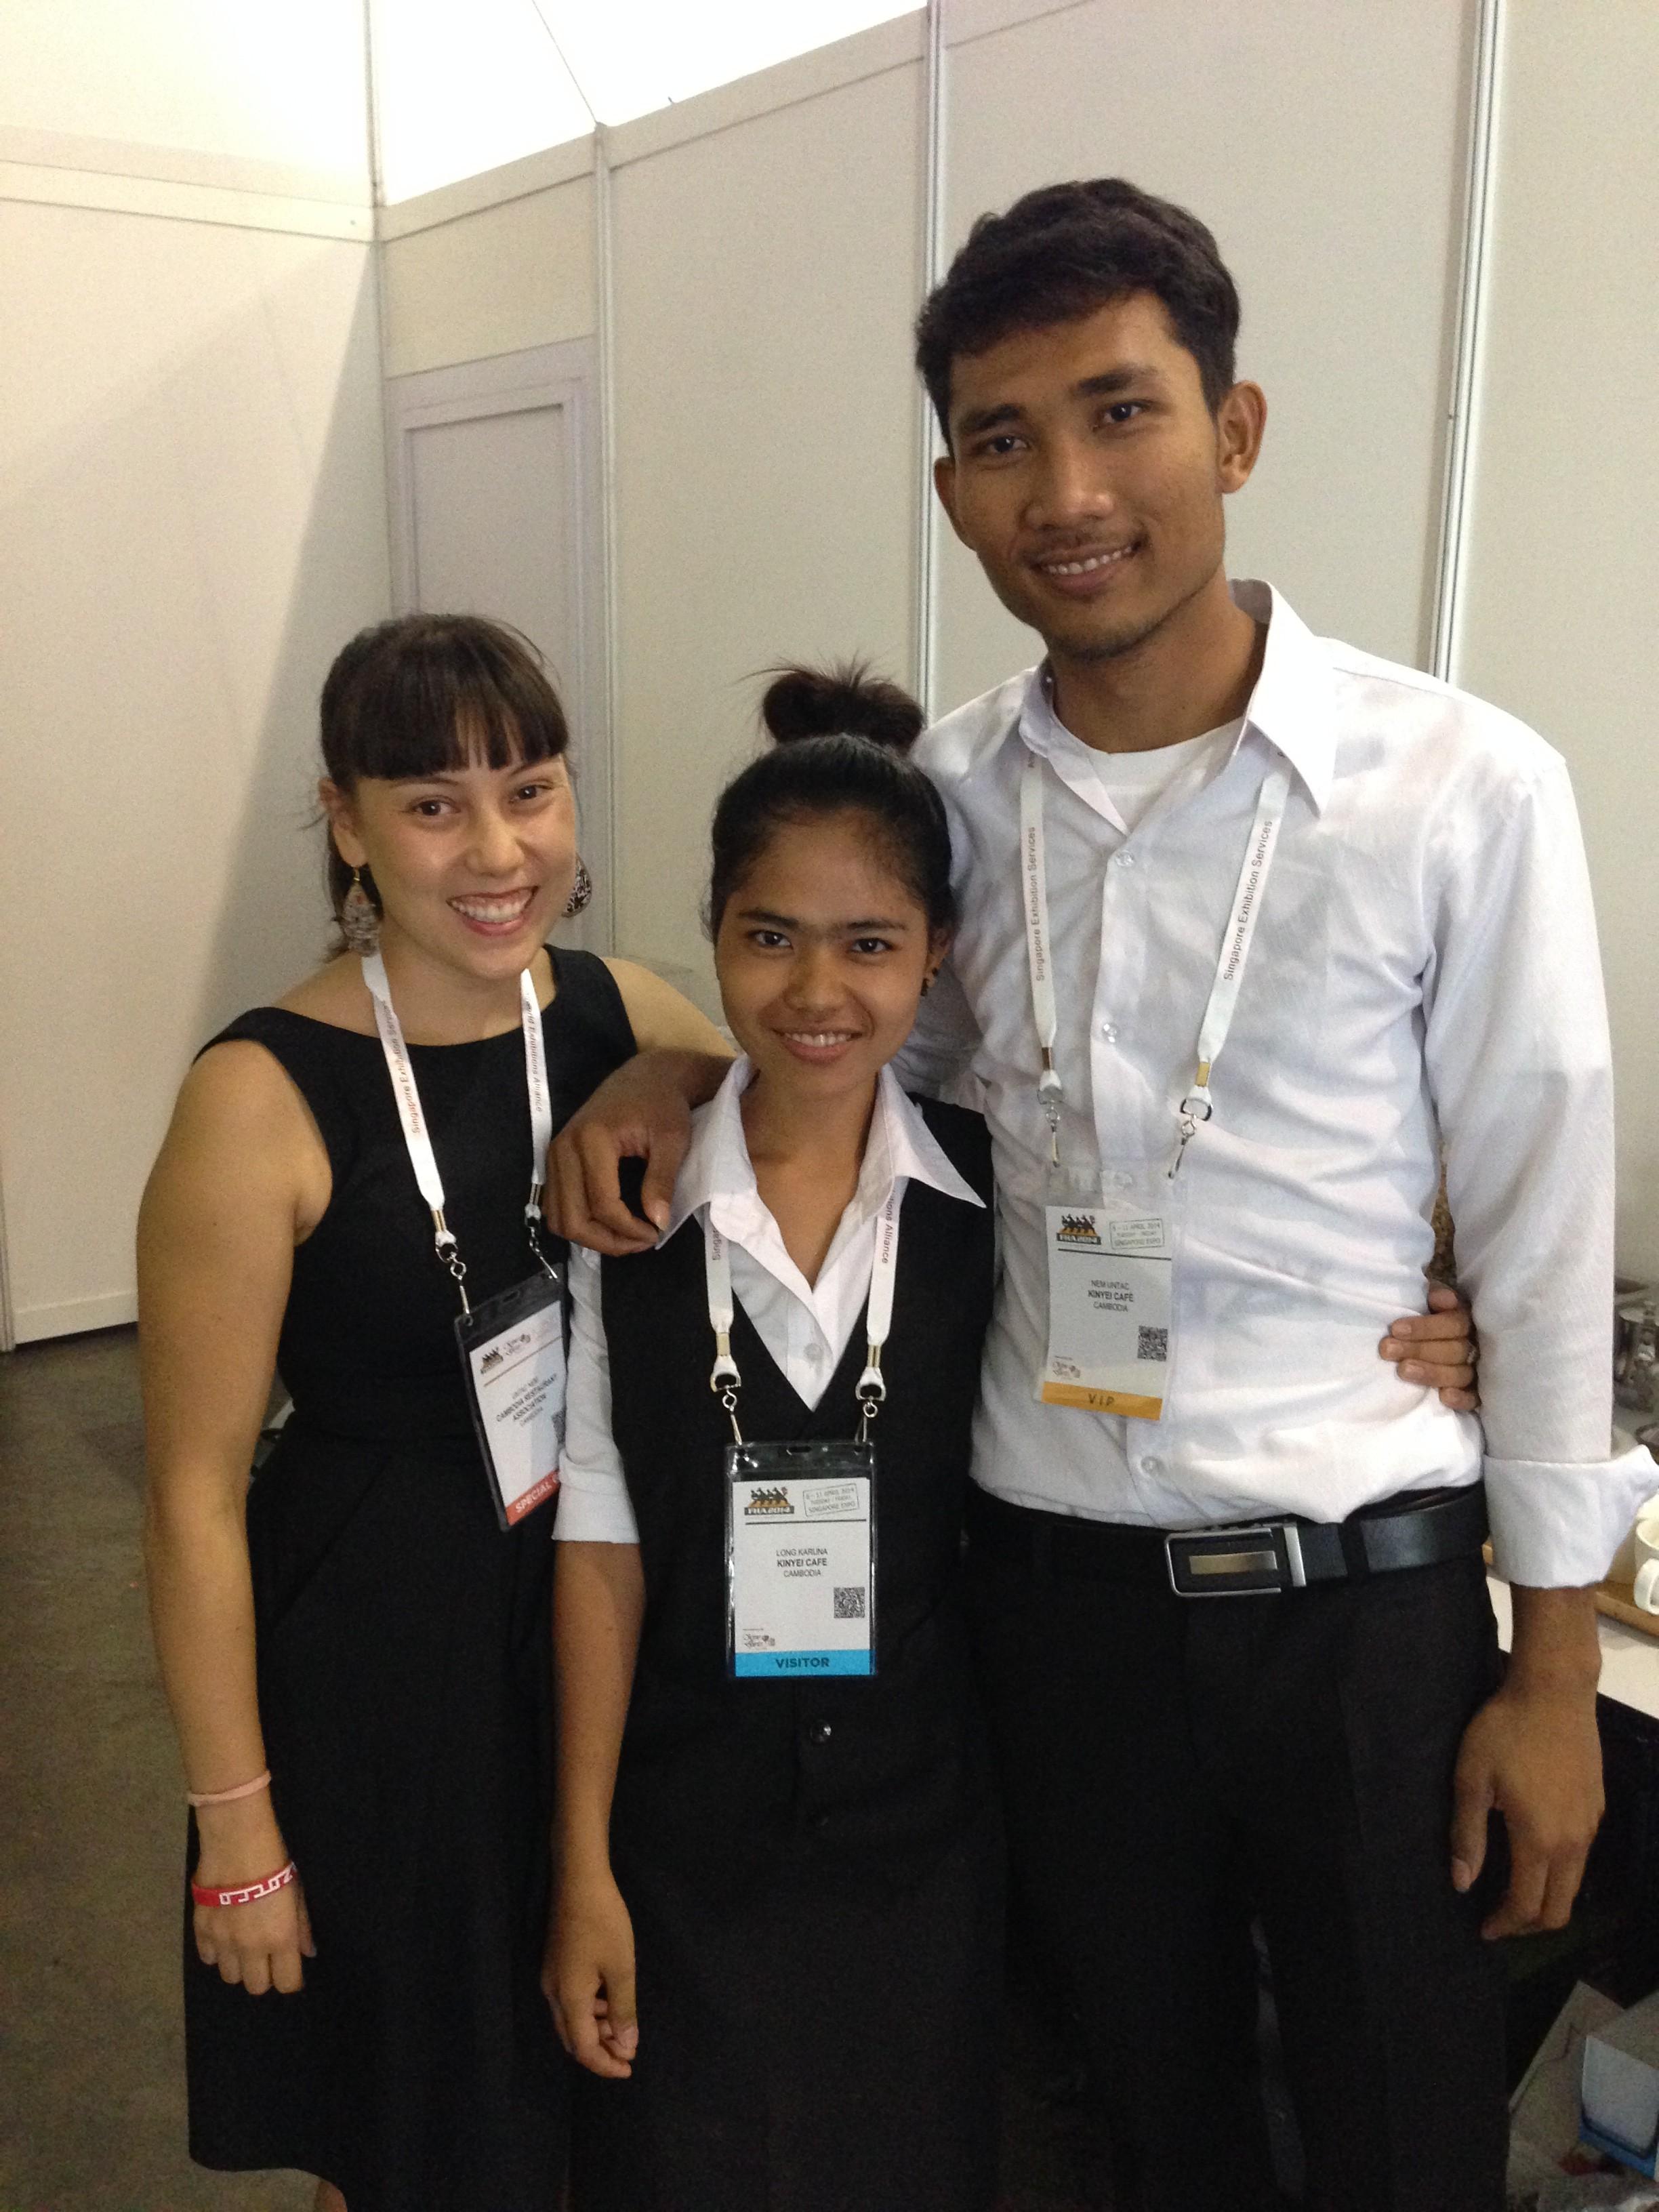 Melina, Sakana and Untac - Go team!